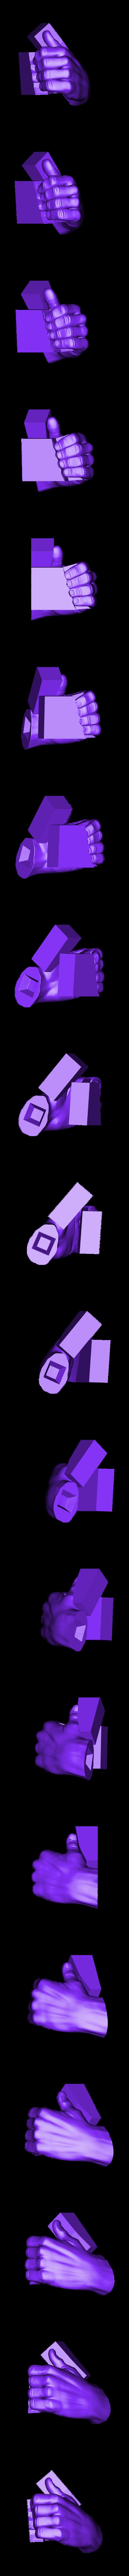 Hand_left.stl Download free STL file Bold Machines: Mr. Walthersnap • 3D print design, boldmachines